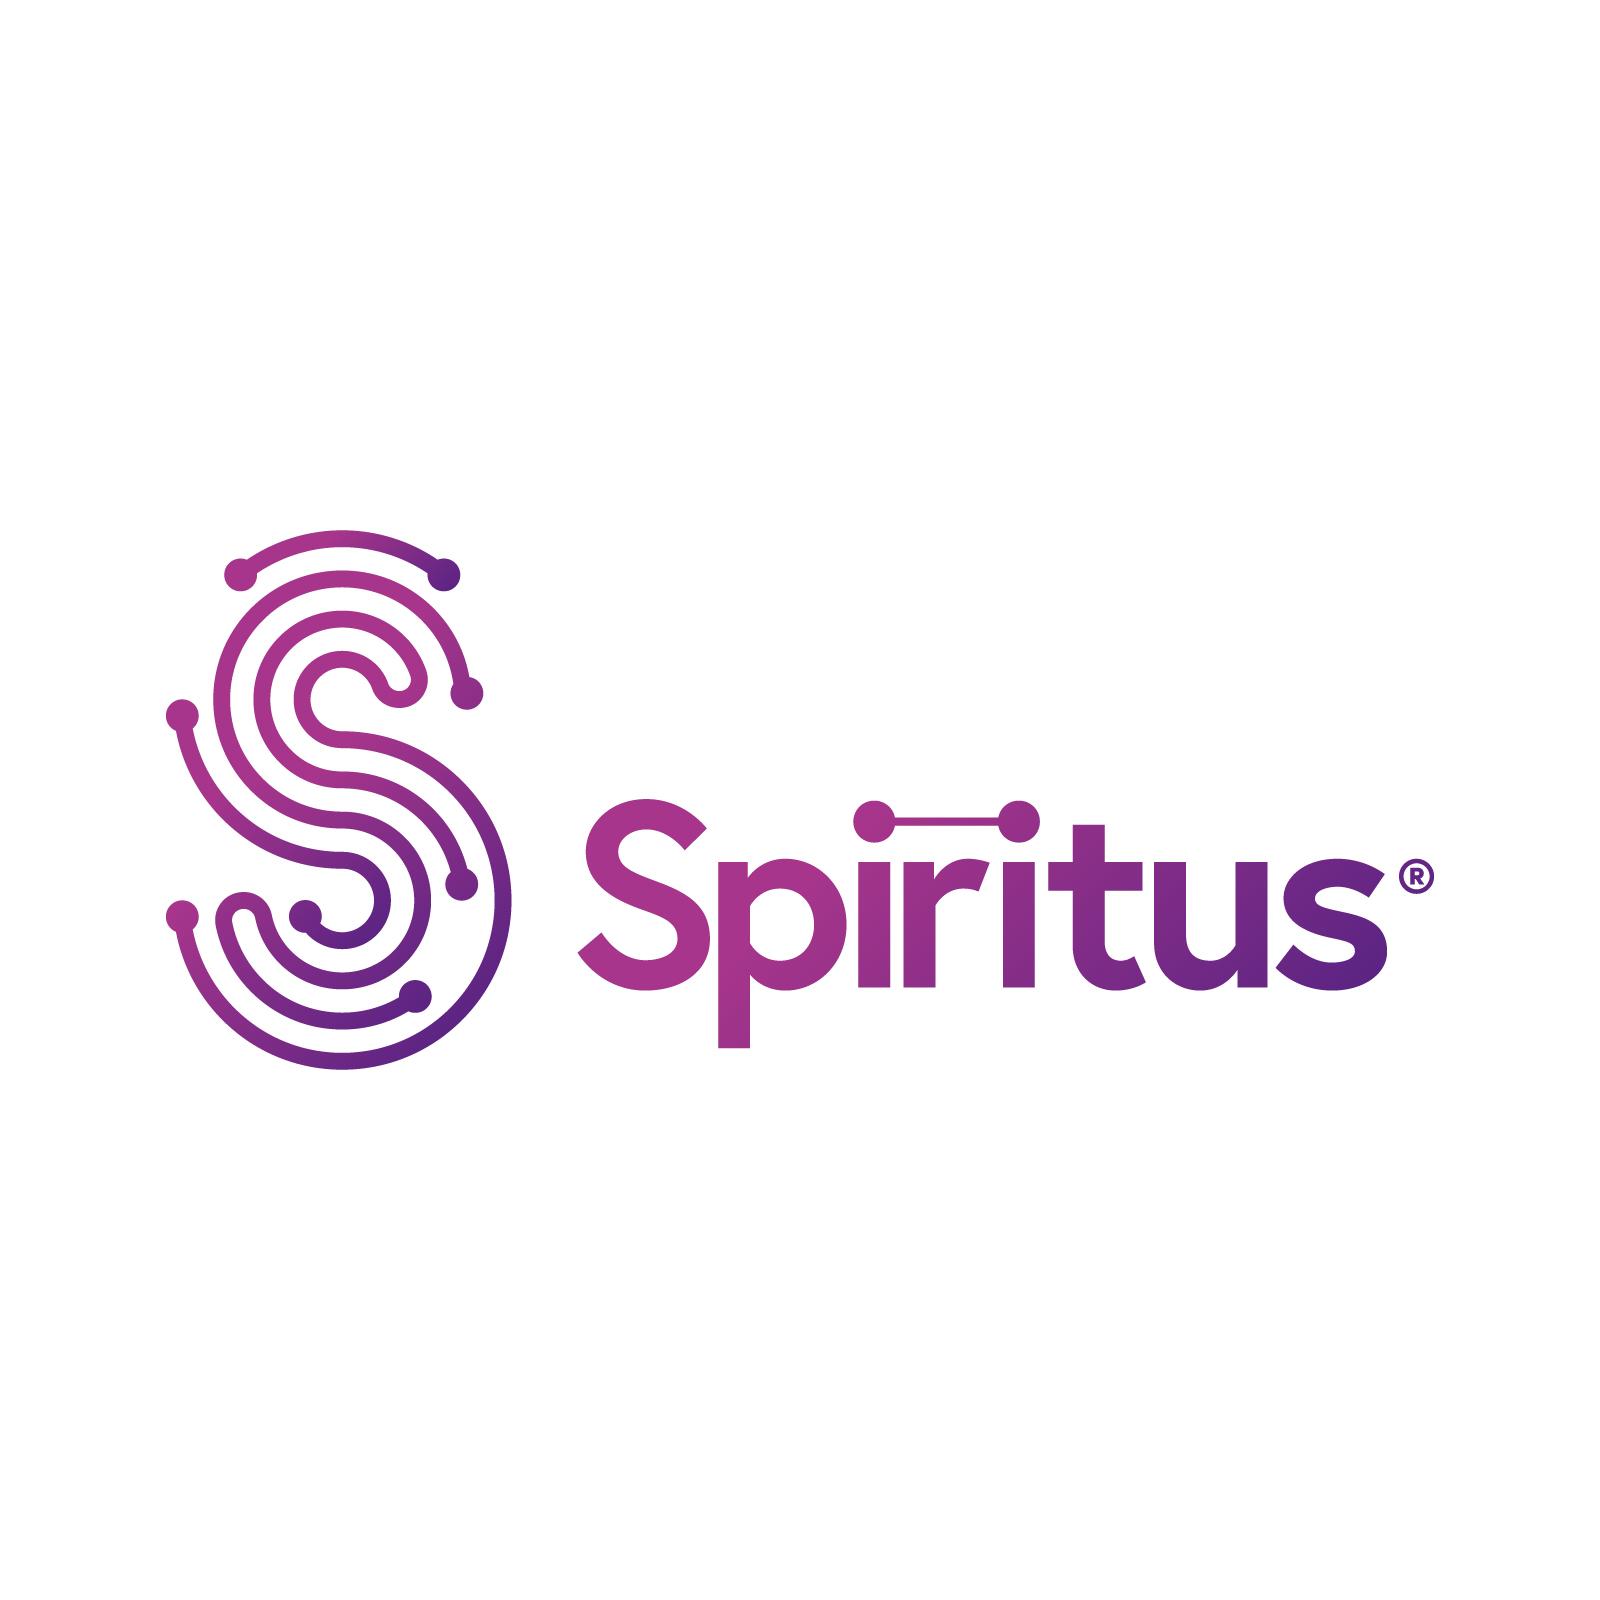 SPIRITUS_2@2x-100.jpg